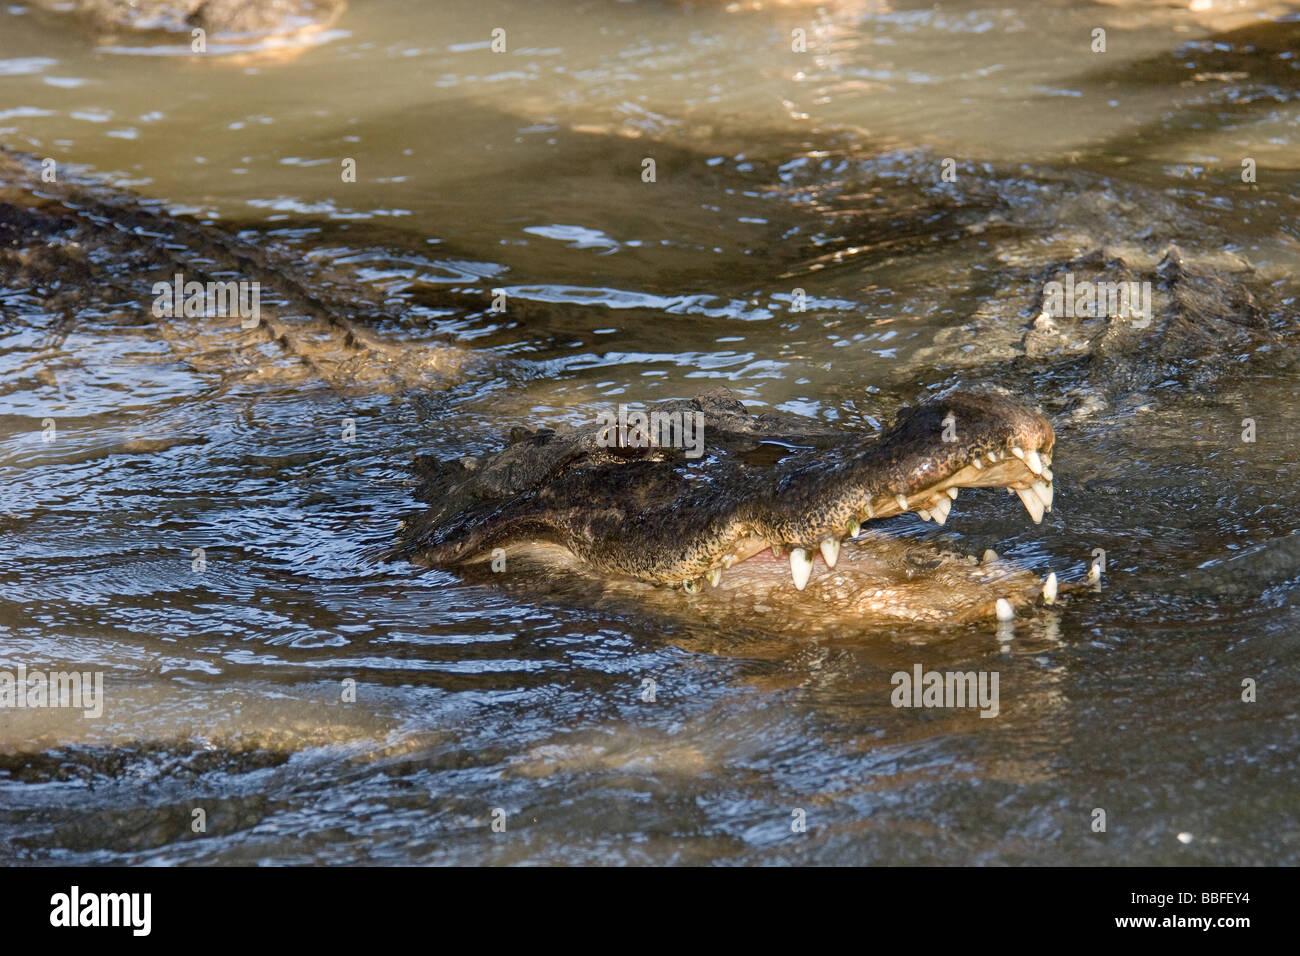 American Alligator Alligator mississippiensis in Florida - Stock Image